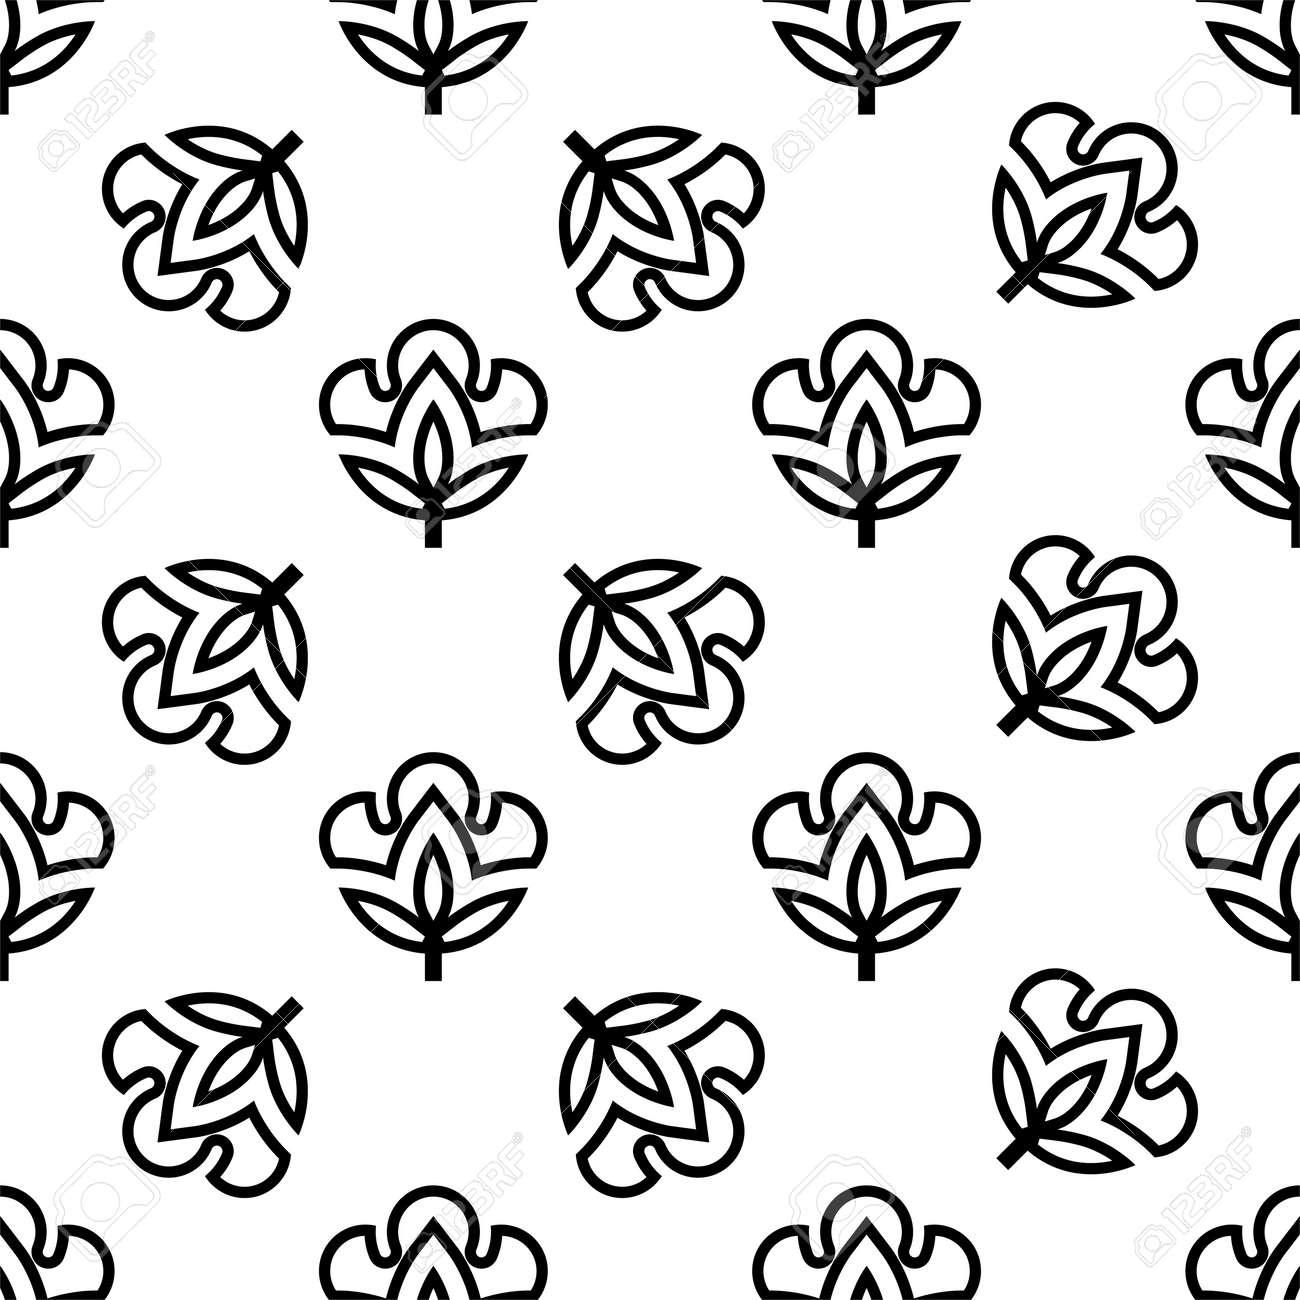 Cotton Flower Icon Seamless Pattern, Cotton Ball, Cotton Fiber Seamless Pattern Vector Art Illustration - 148090754